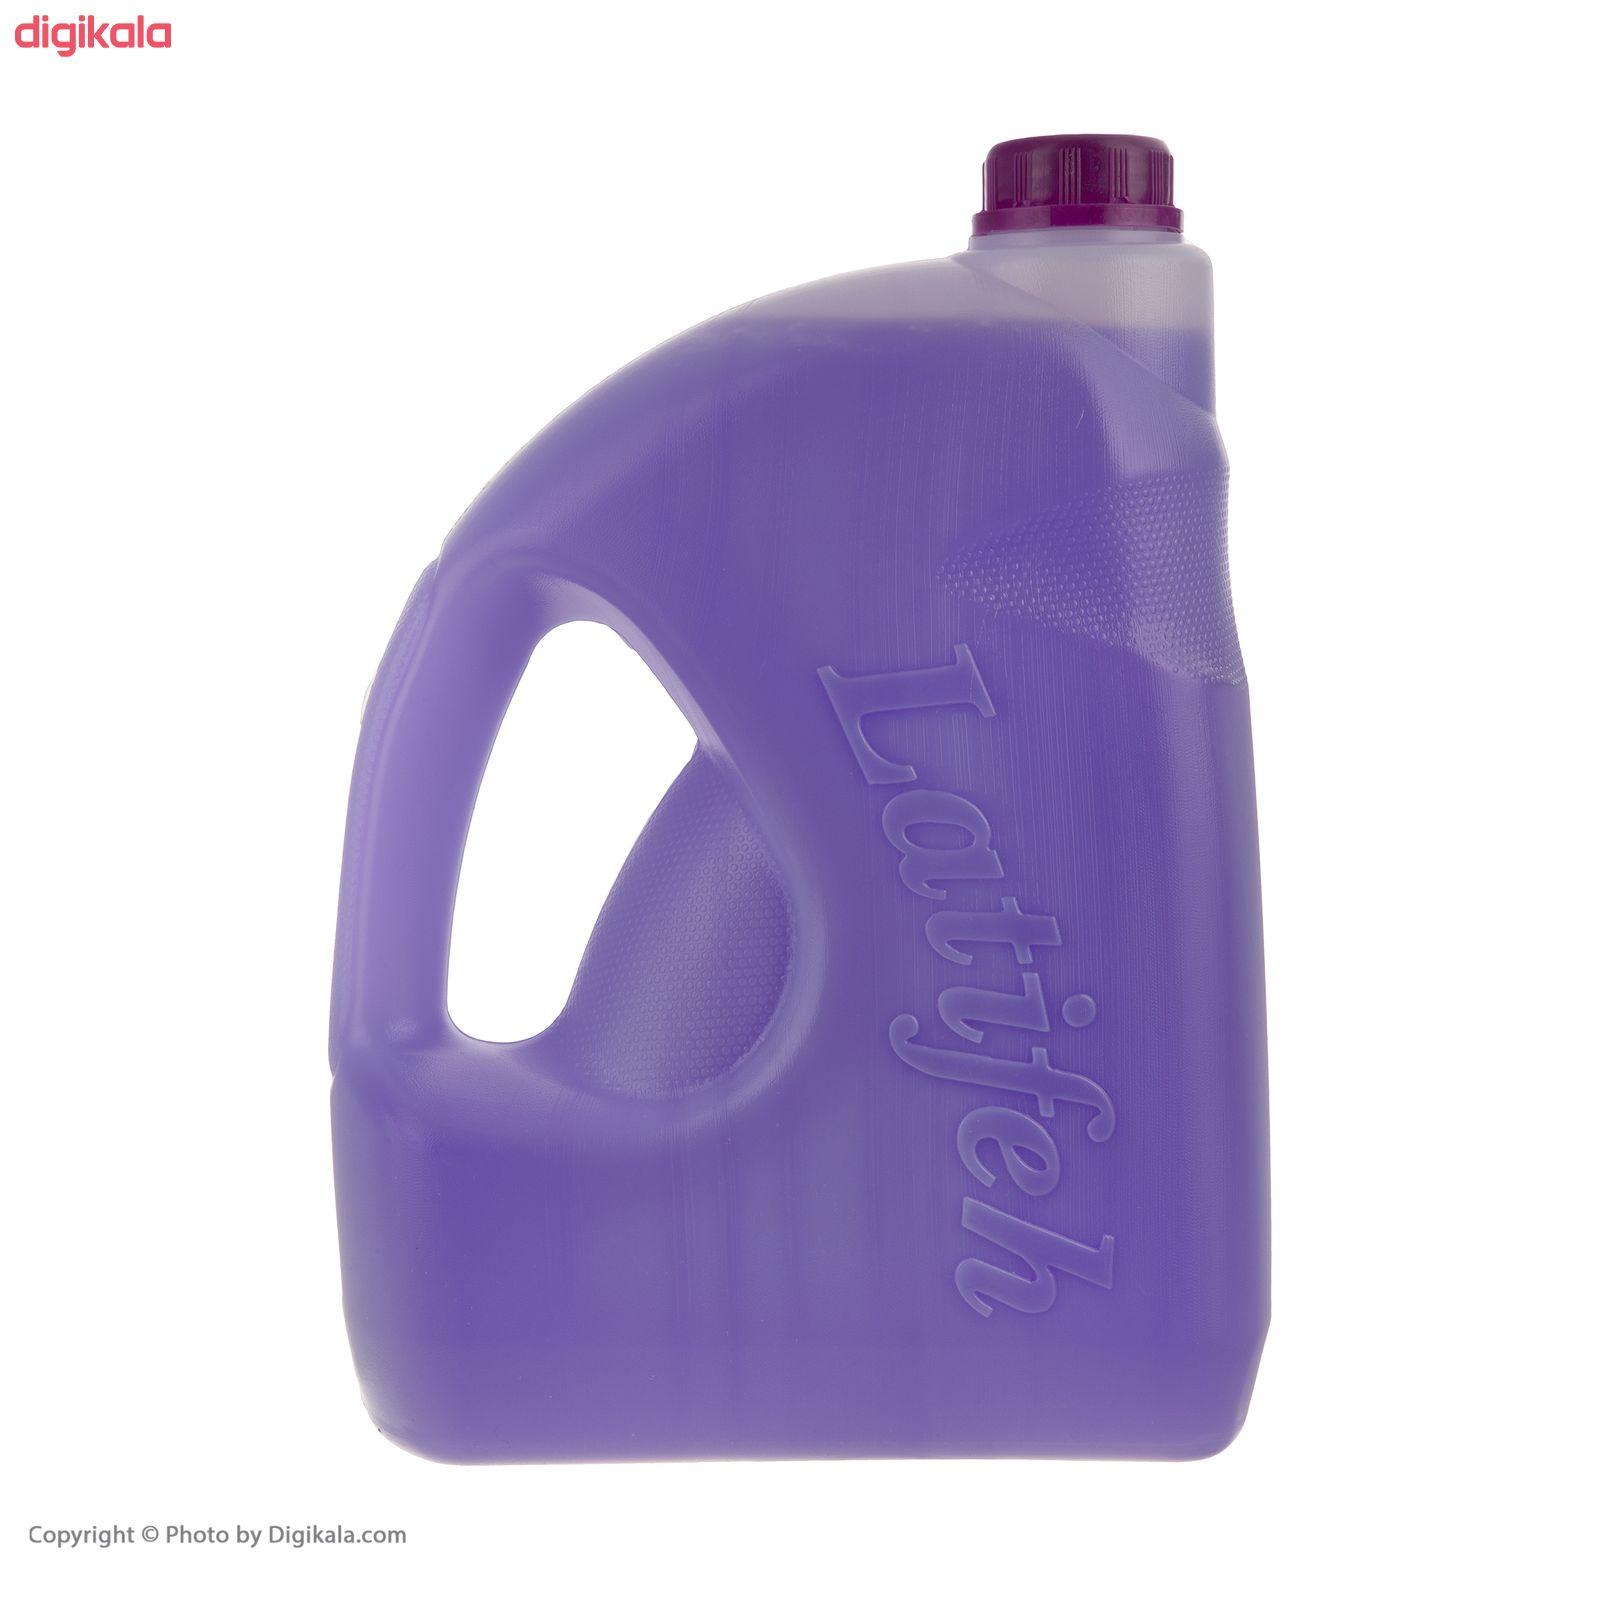 مایع دستشویی لطیفه مدل  Violet Flower وزن 3.8 کیلوگرم main 1 3